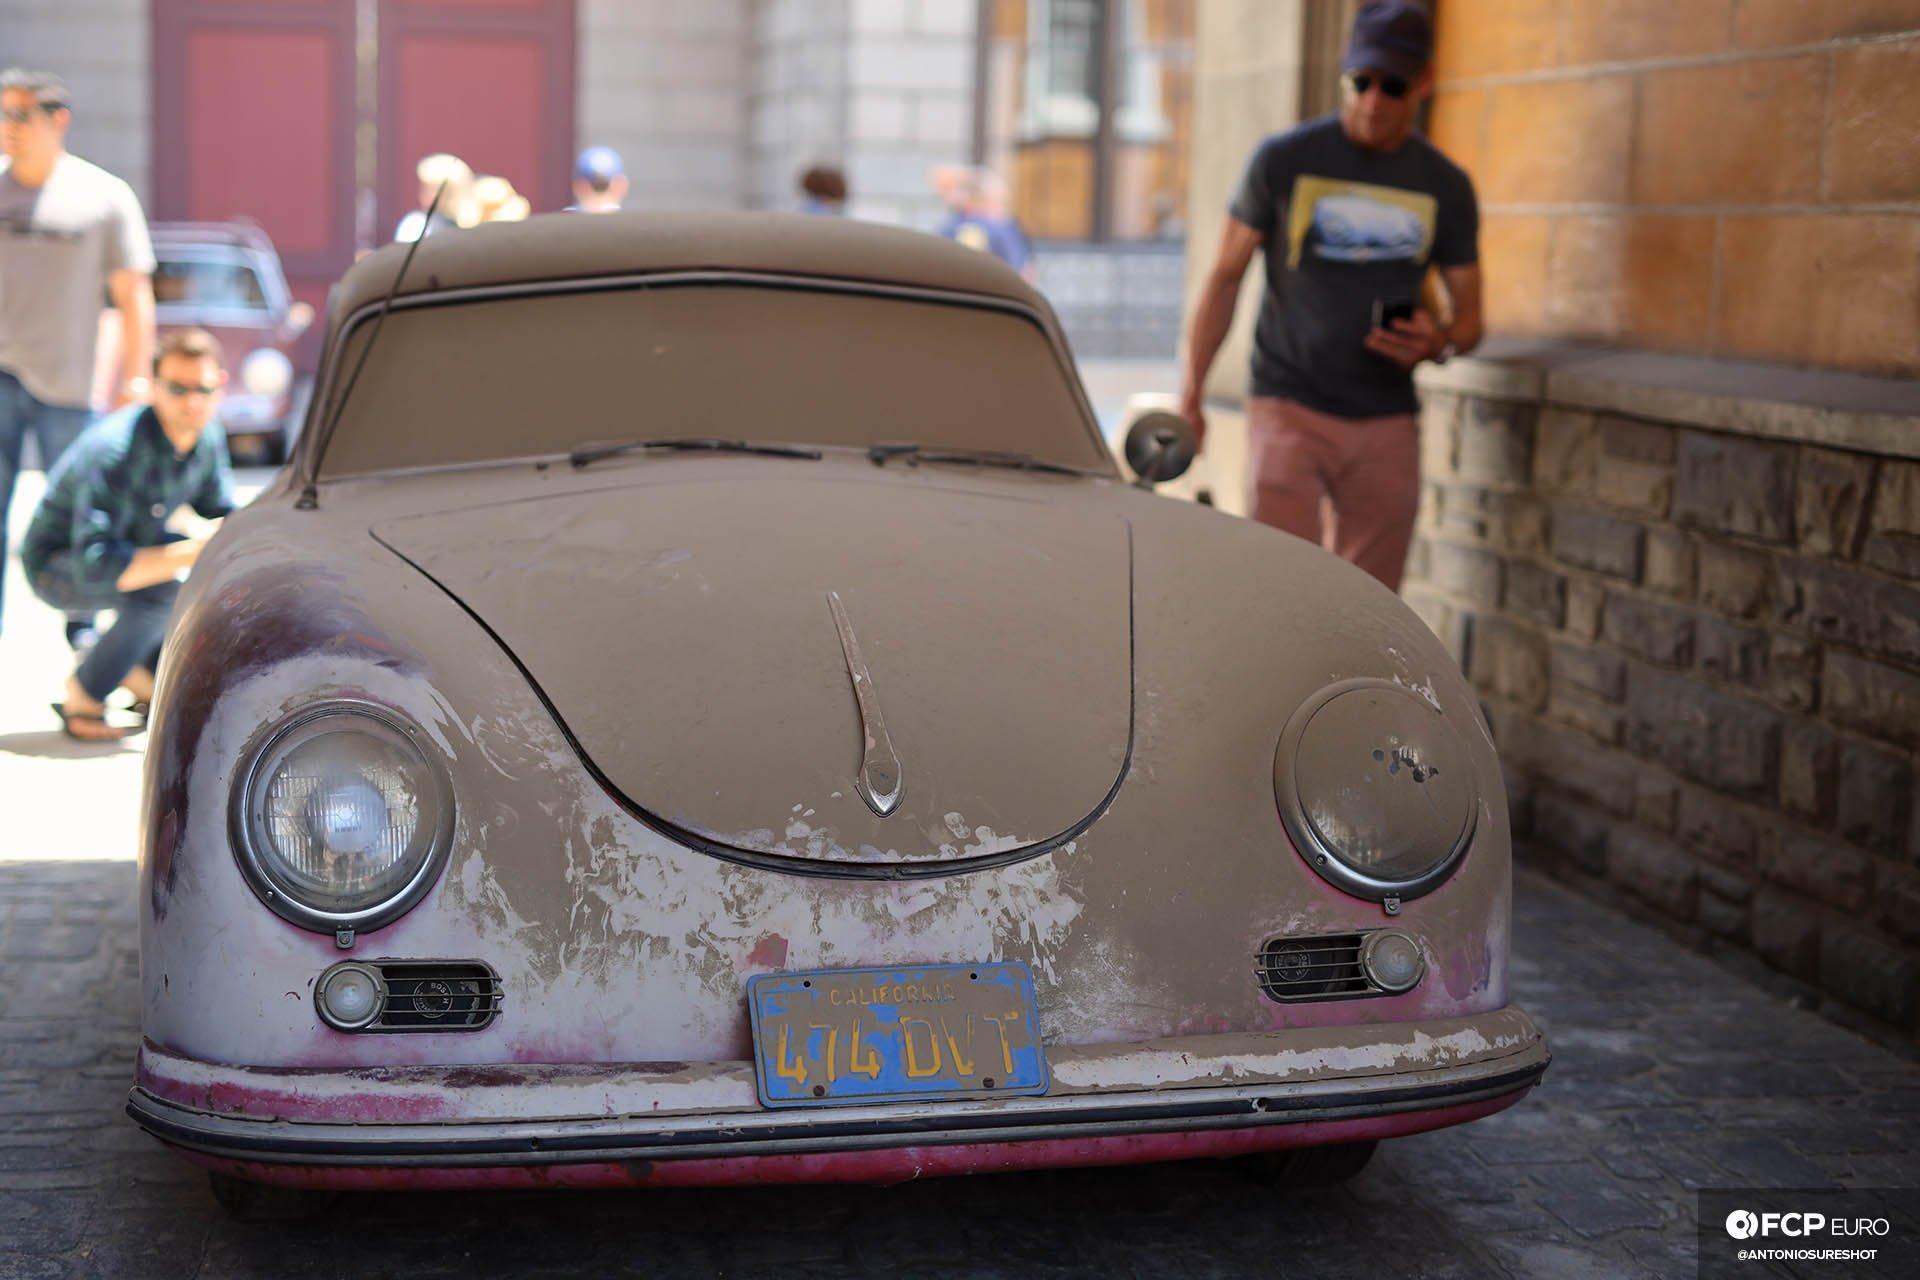 Luftgekühlt Air Cooled Porsche 356 Pre A barn find